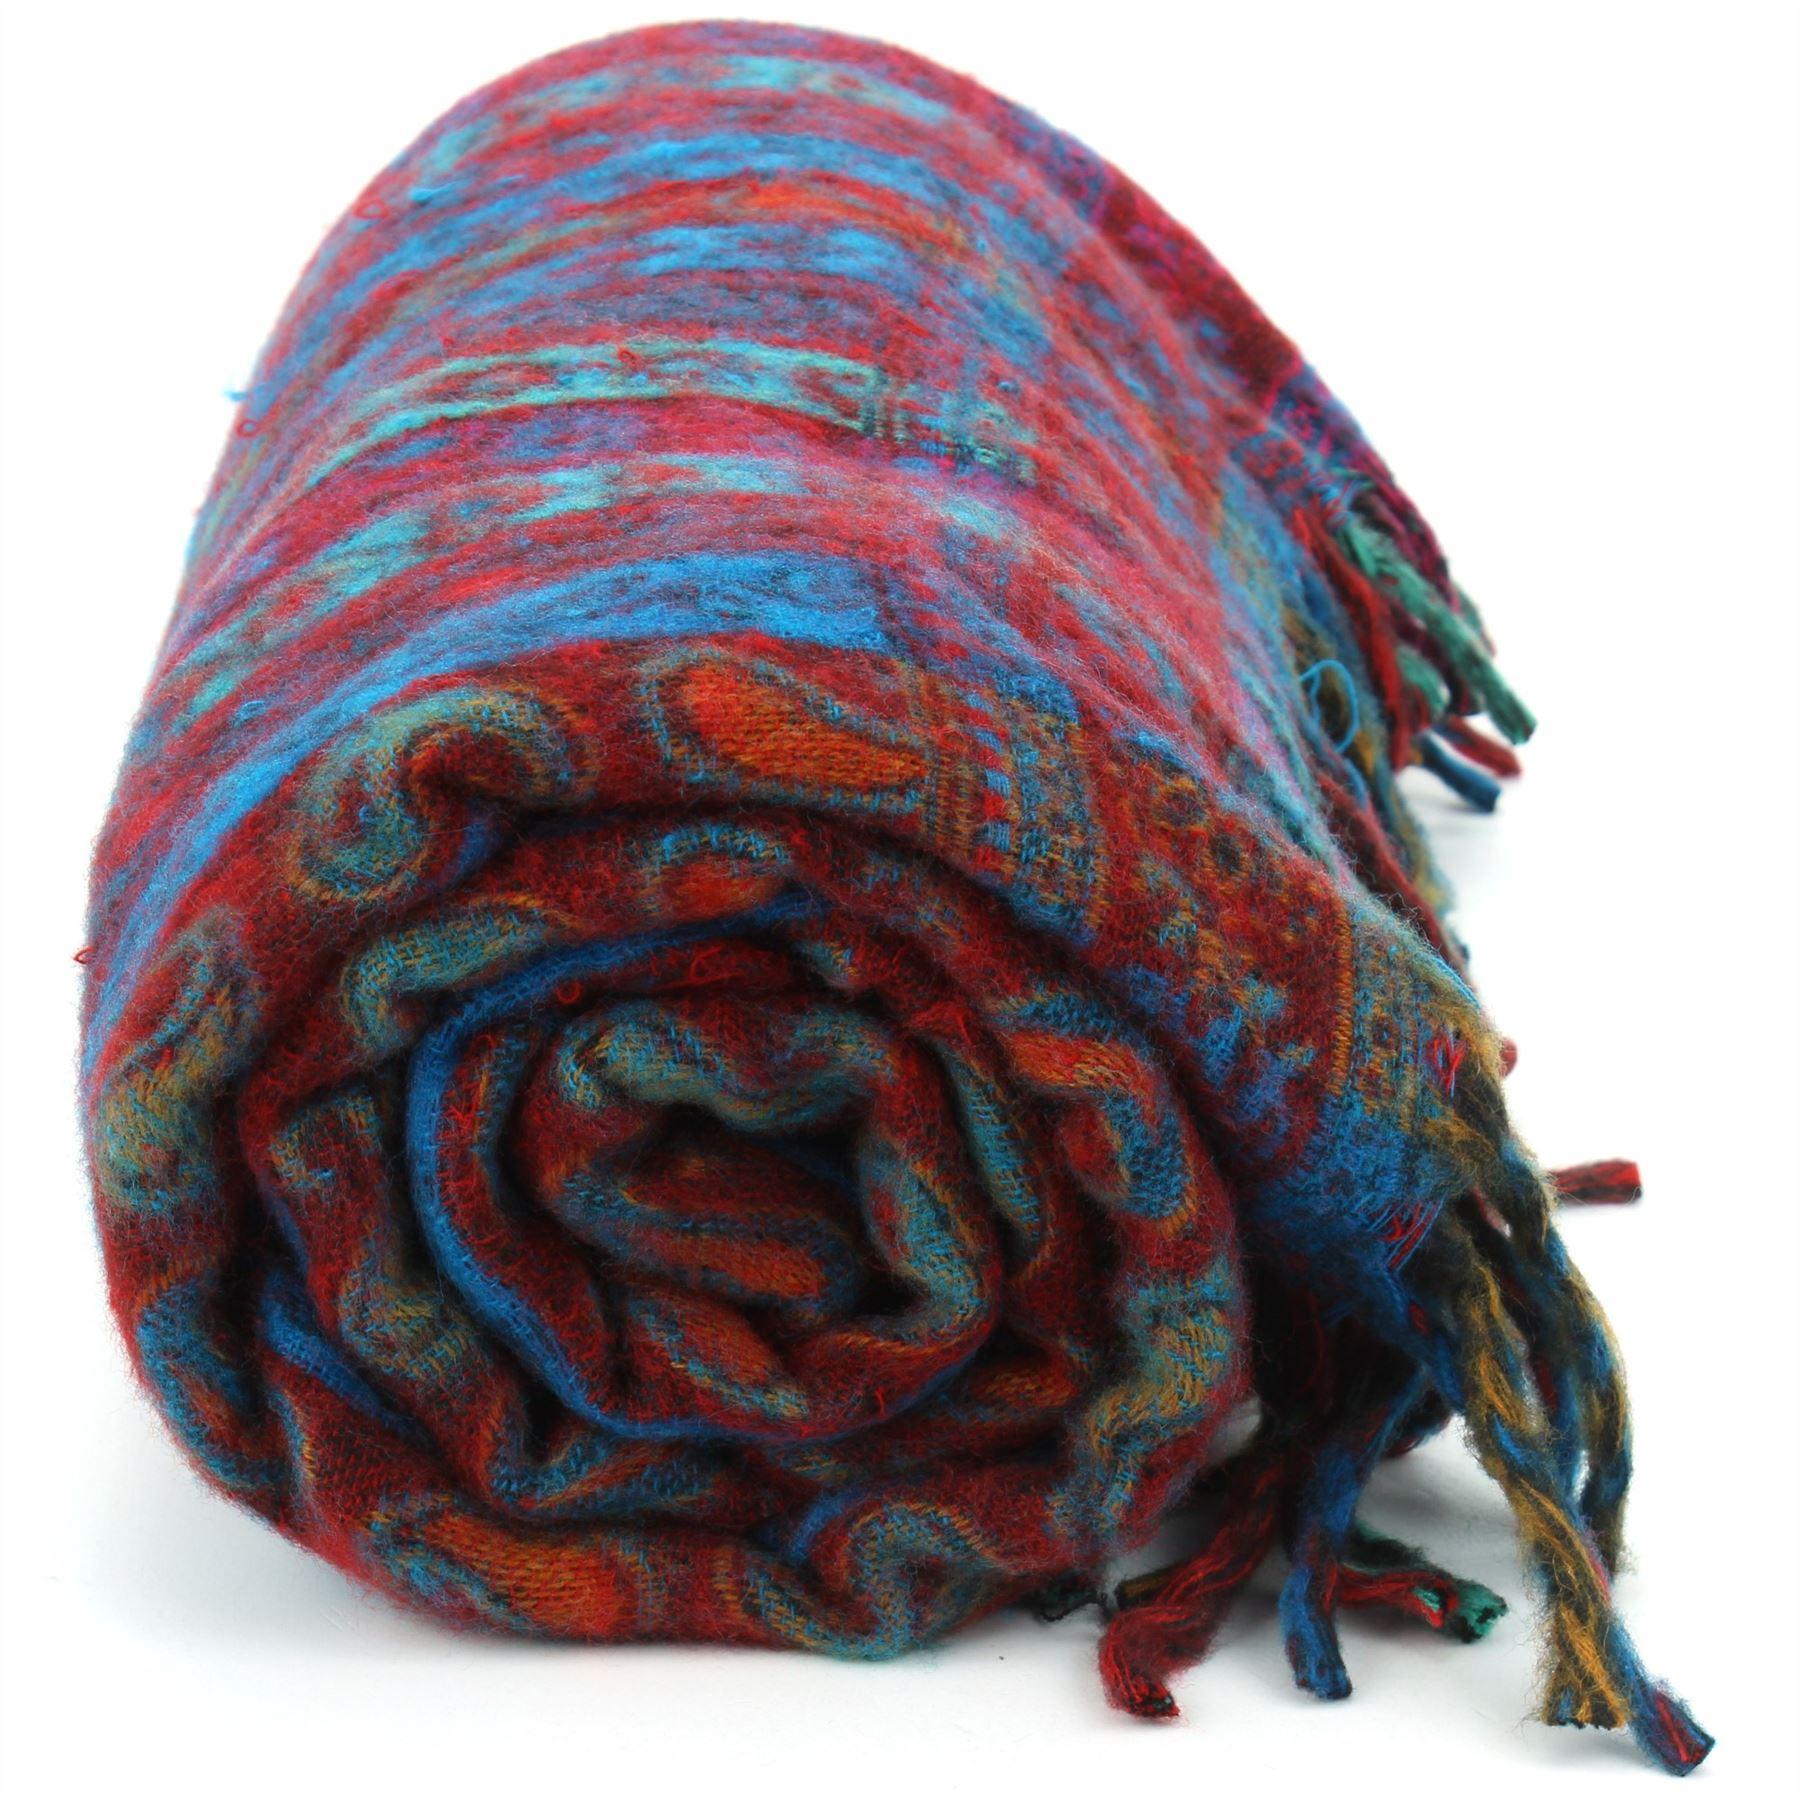 Acrylic-Wool-Blanket-Shawl-Wrap-Throw-Finest-Softest-India-Stripe-Paisley-Travel thumbnail 44